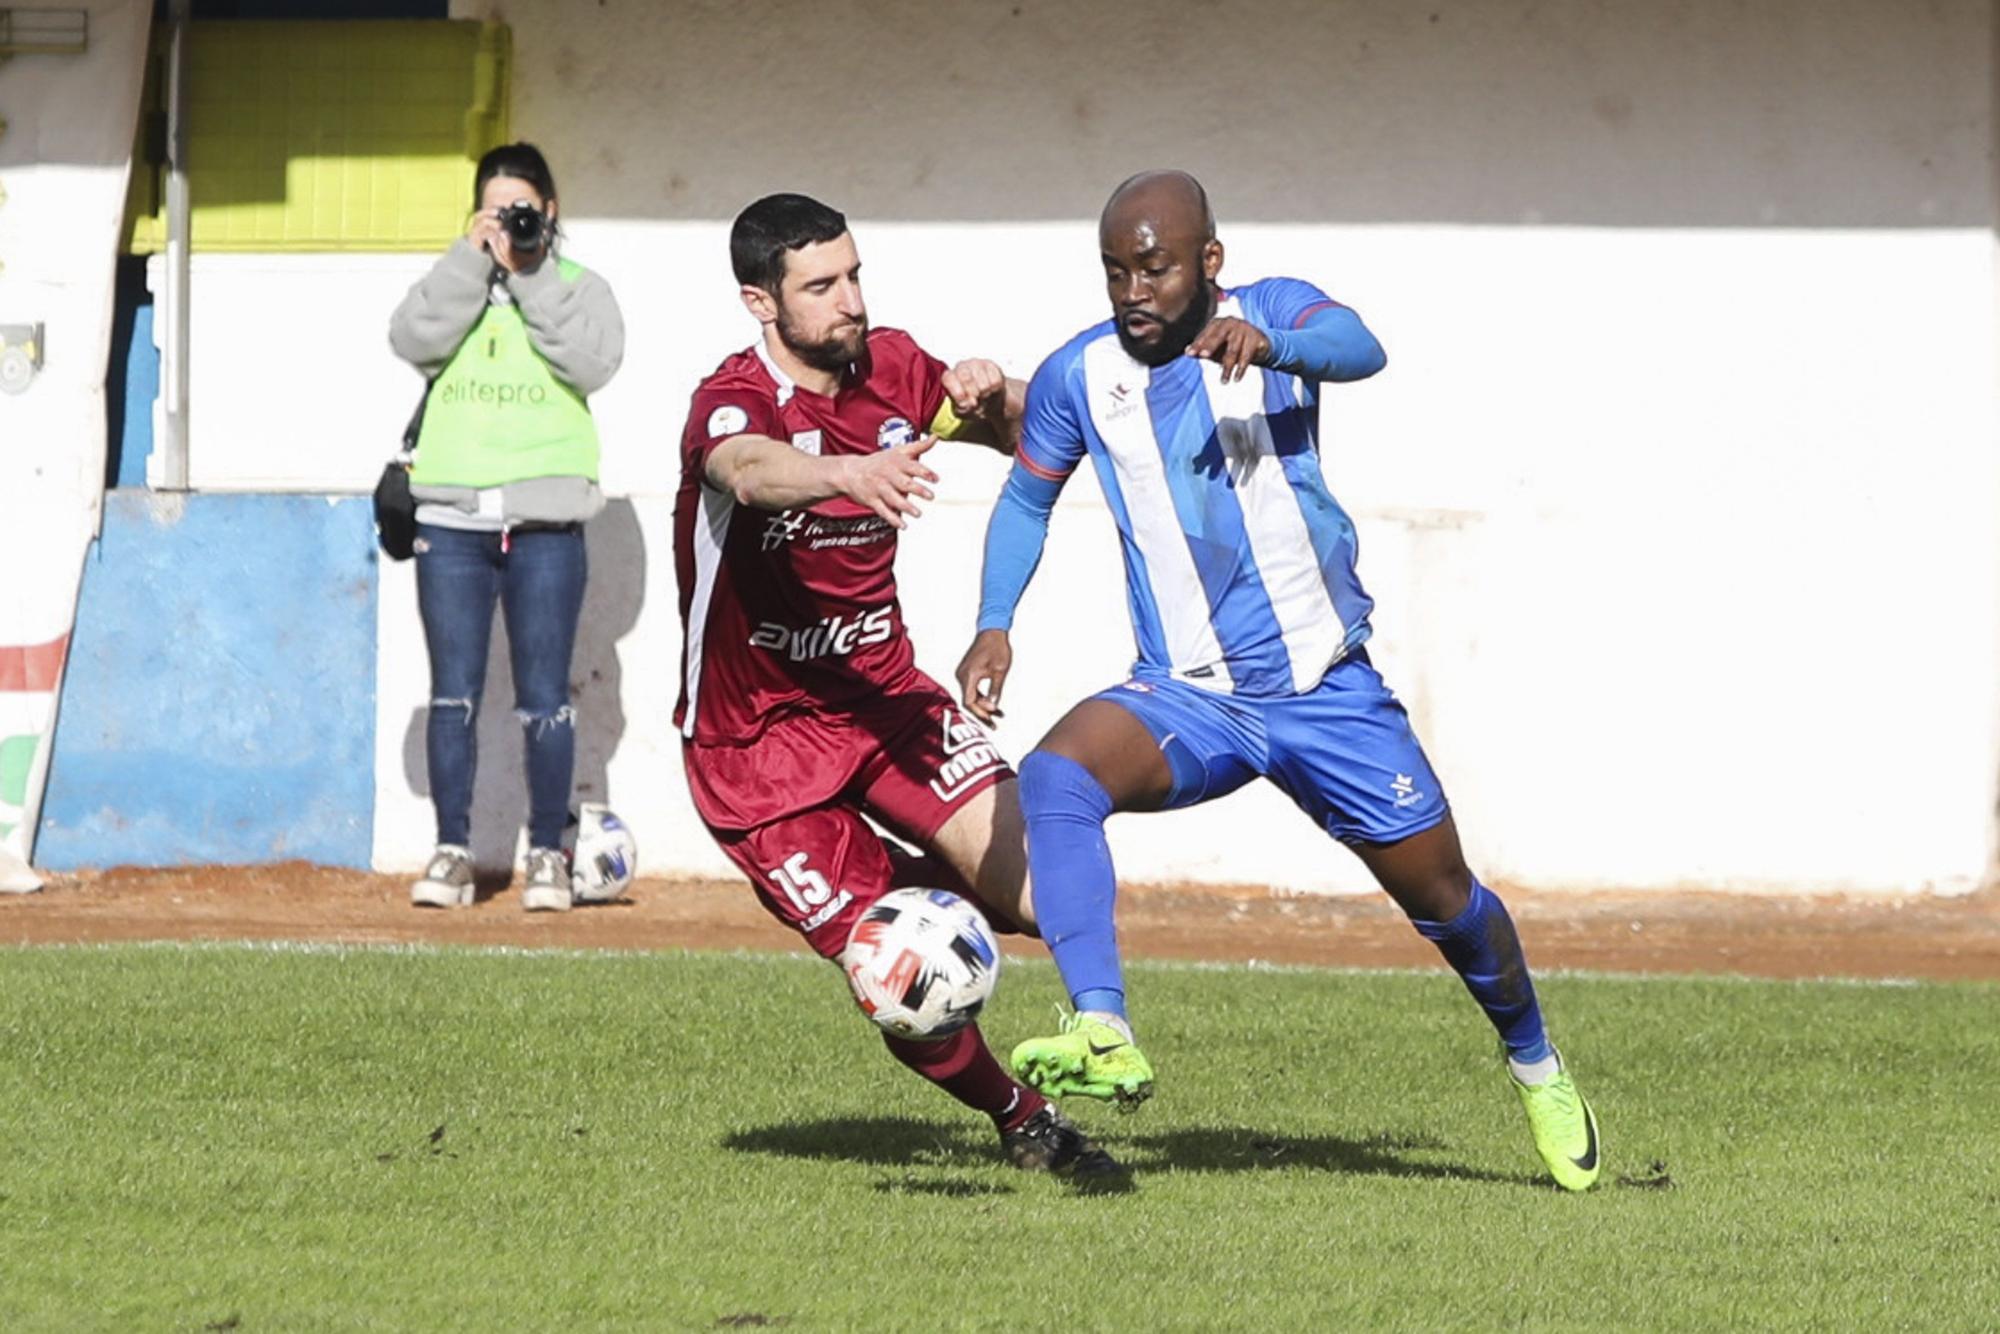 Real Avilés-Avilés Stadium en el Suárez Puerto (3-0)